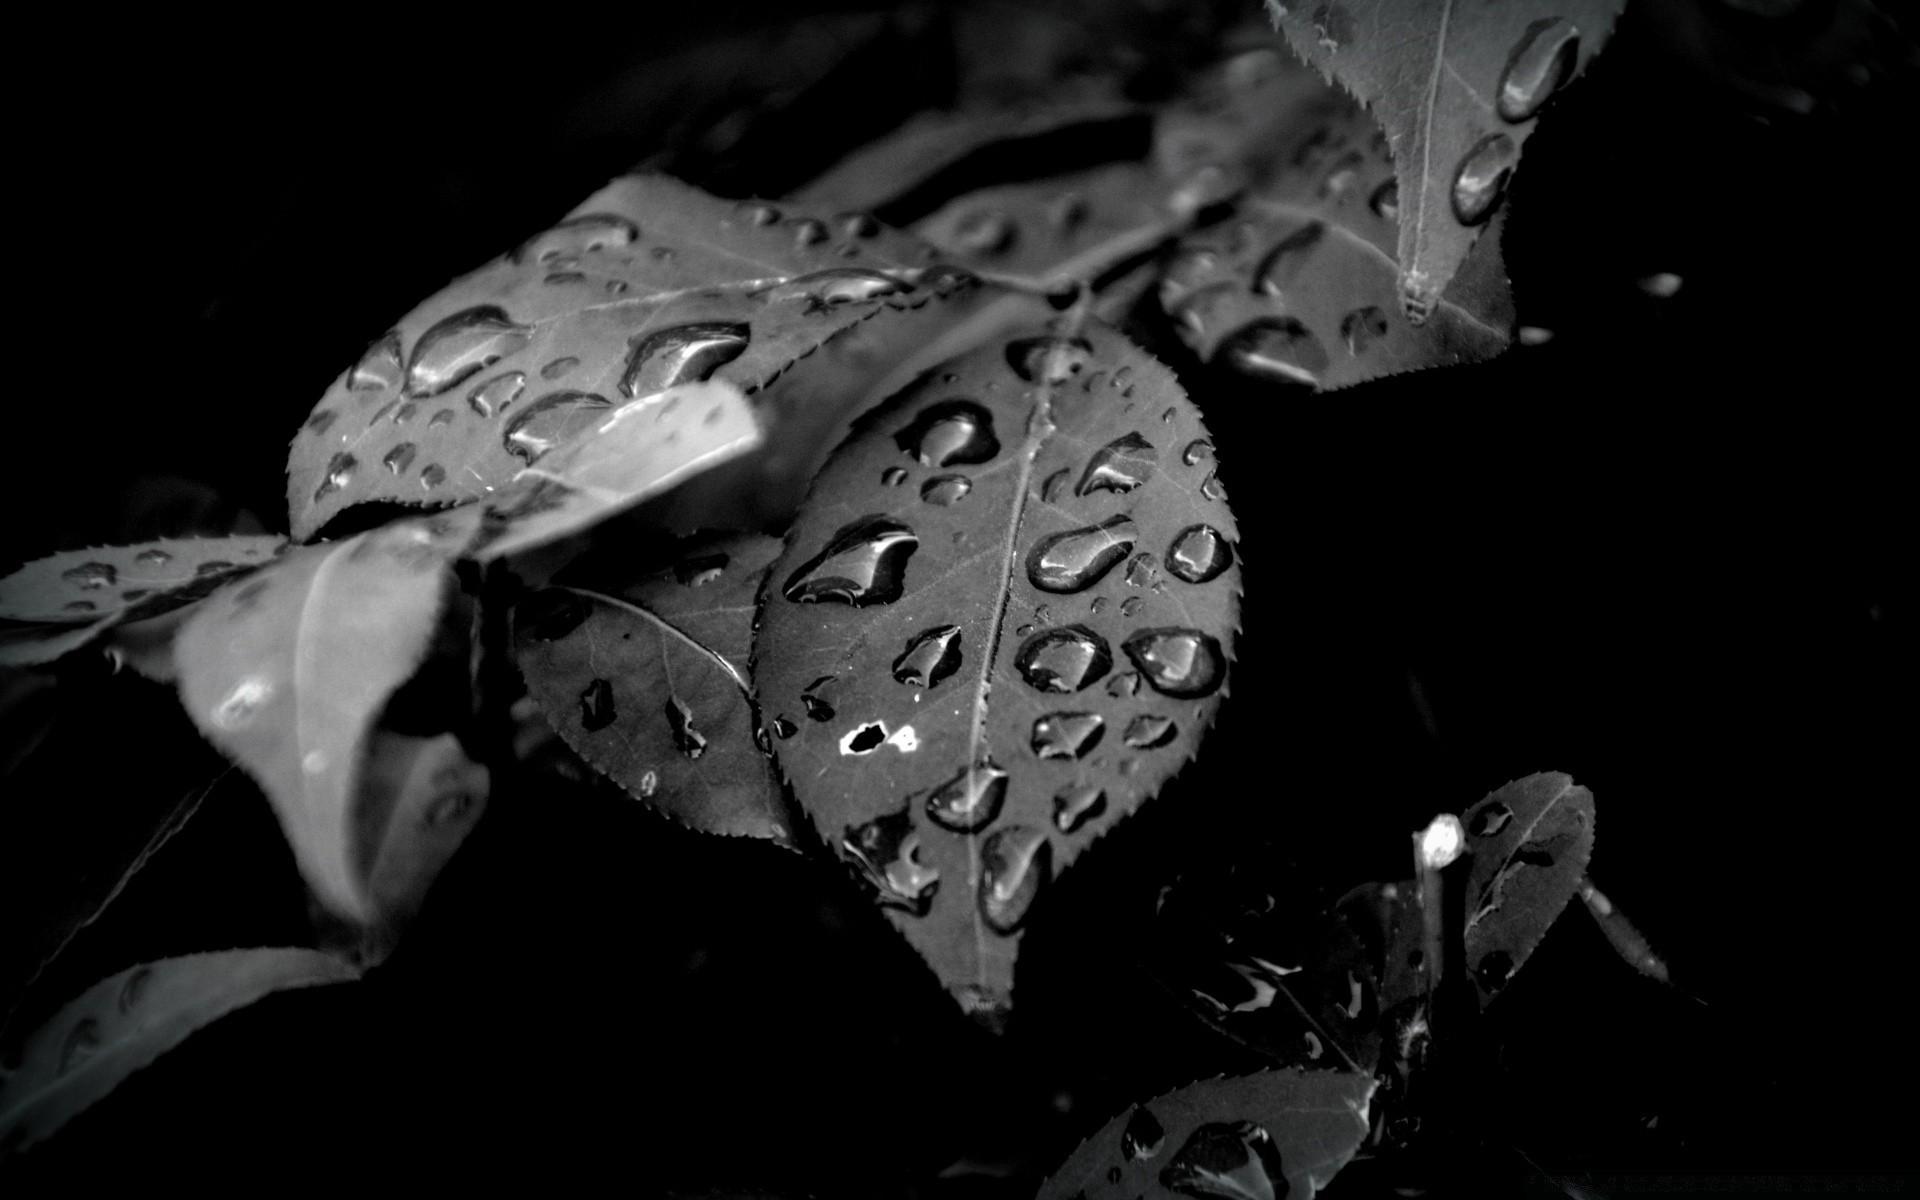 Черно-белые картинки на андроид